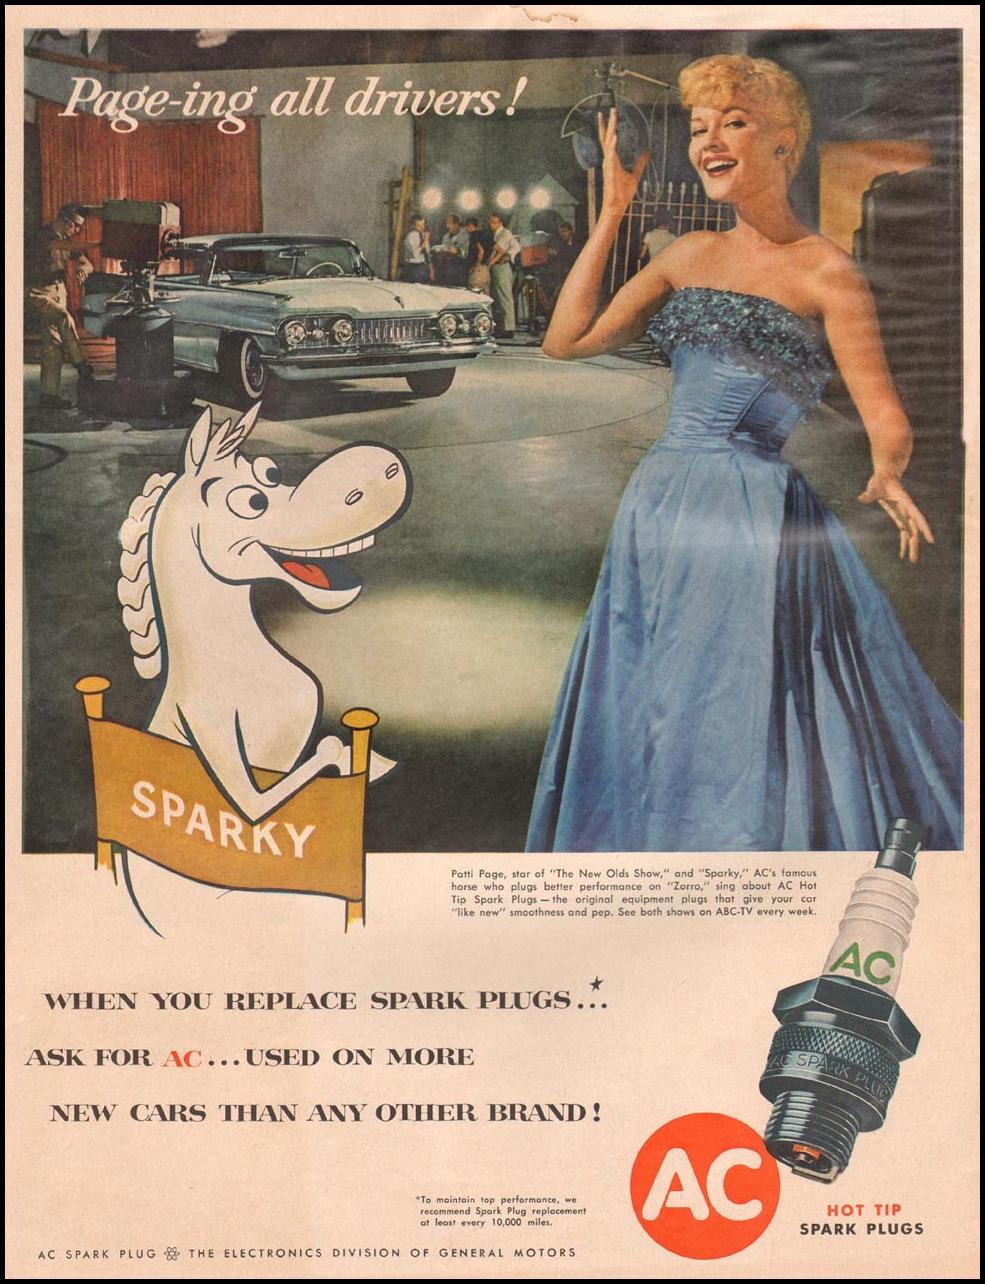 AC SPARK PLUGS LIFE 11/24/1957